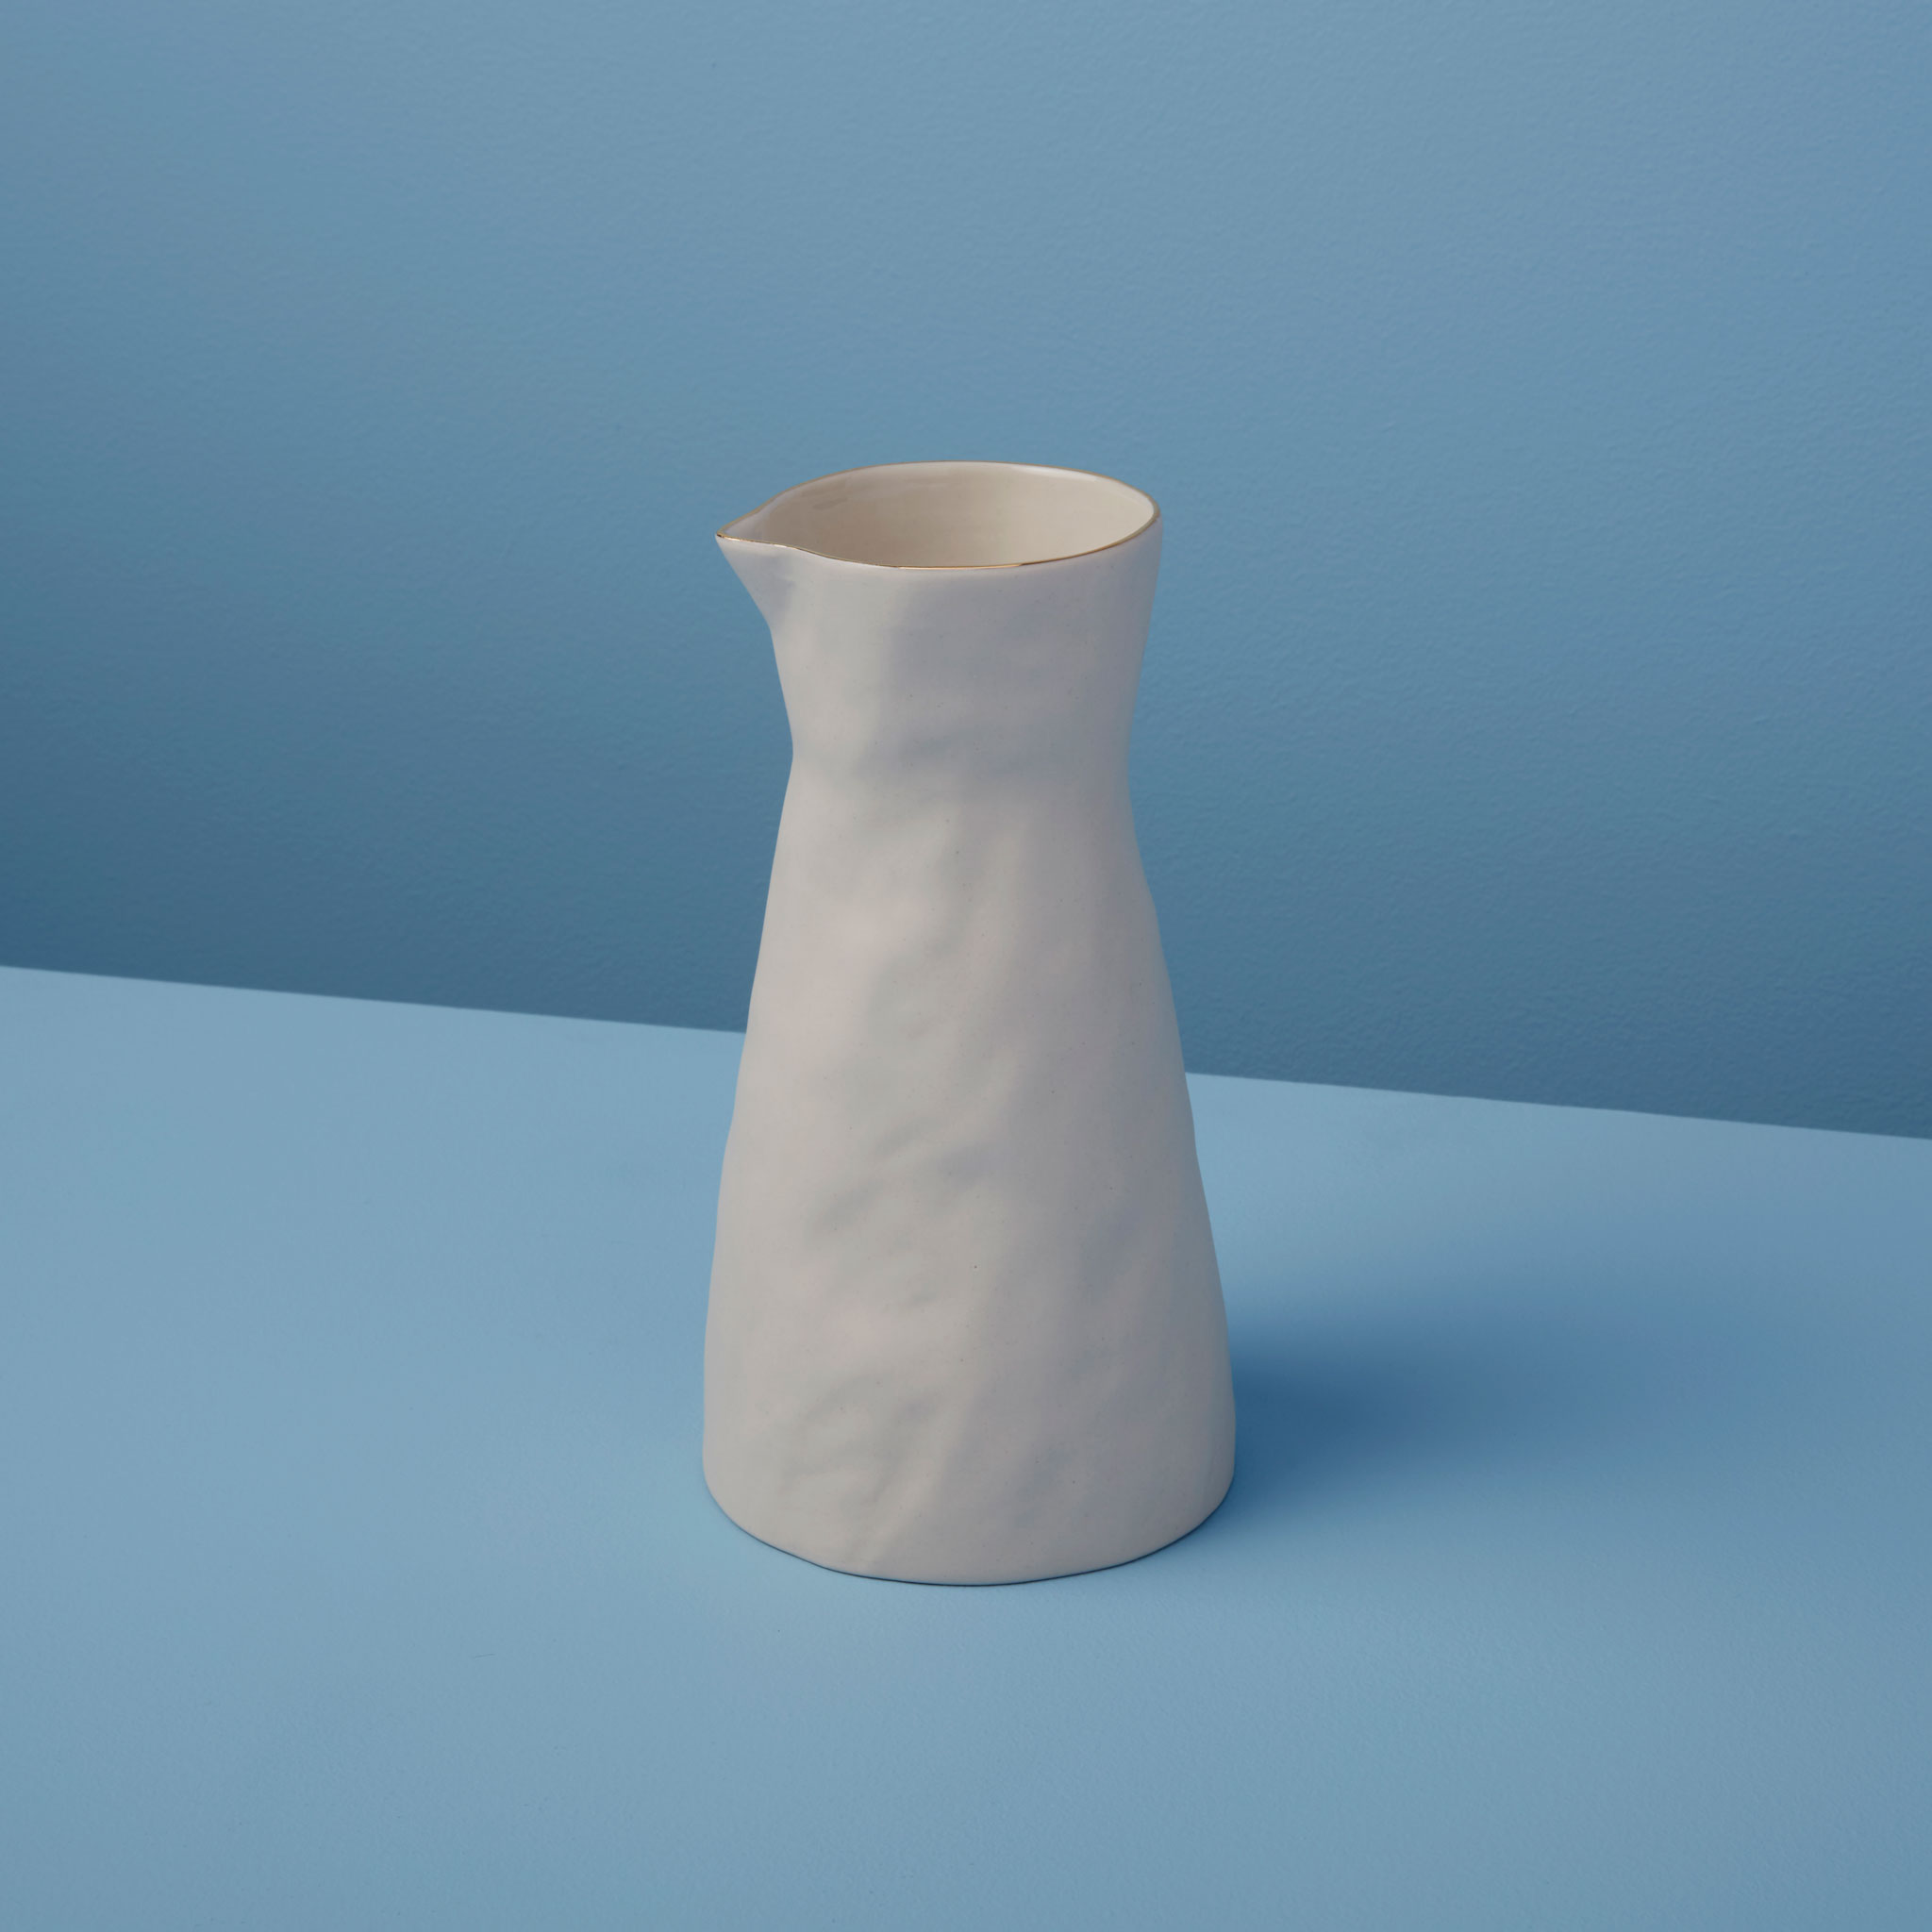 Be-Home_Gold-Rim-Stoneware-Carafe-White-Small_64-747